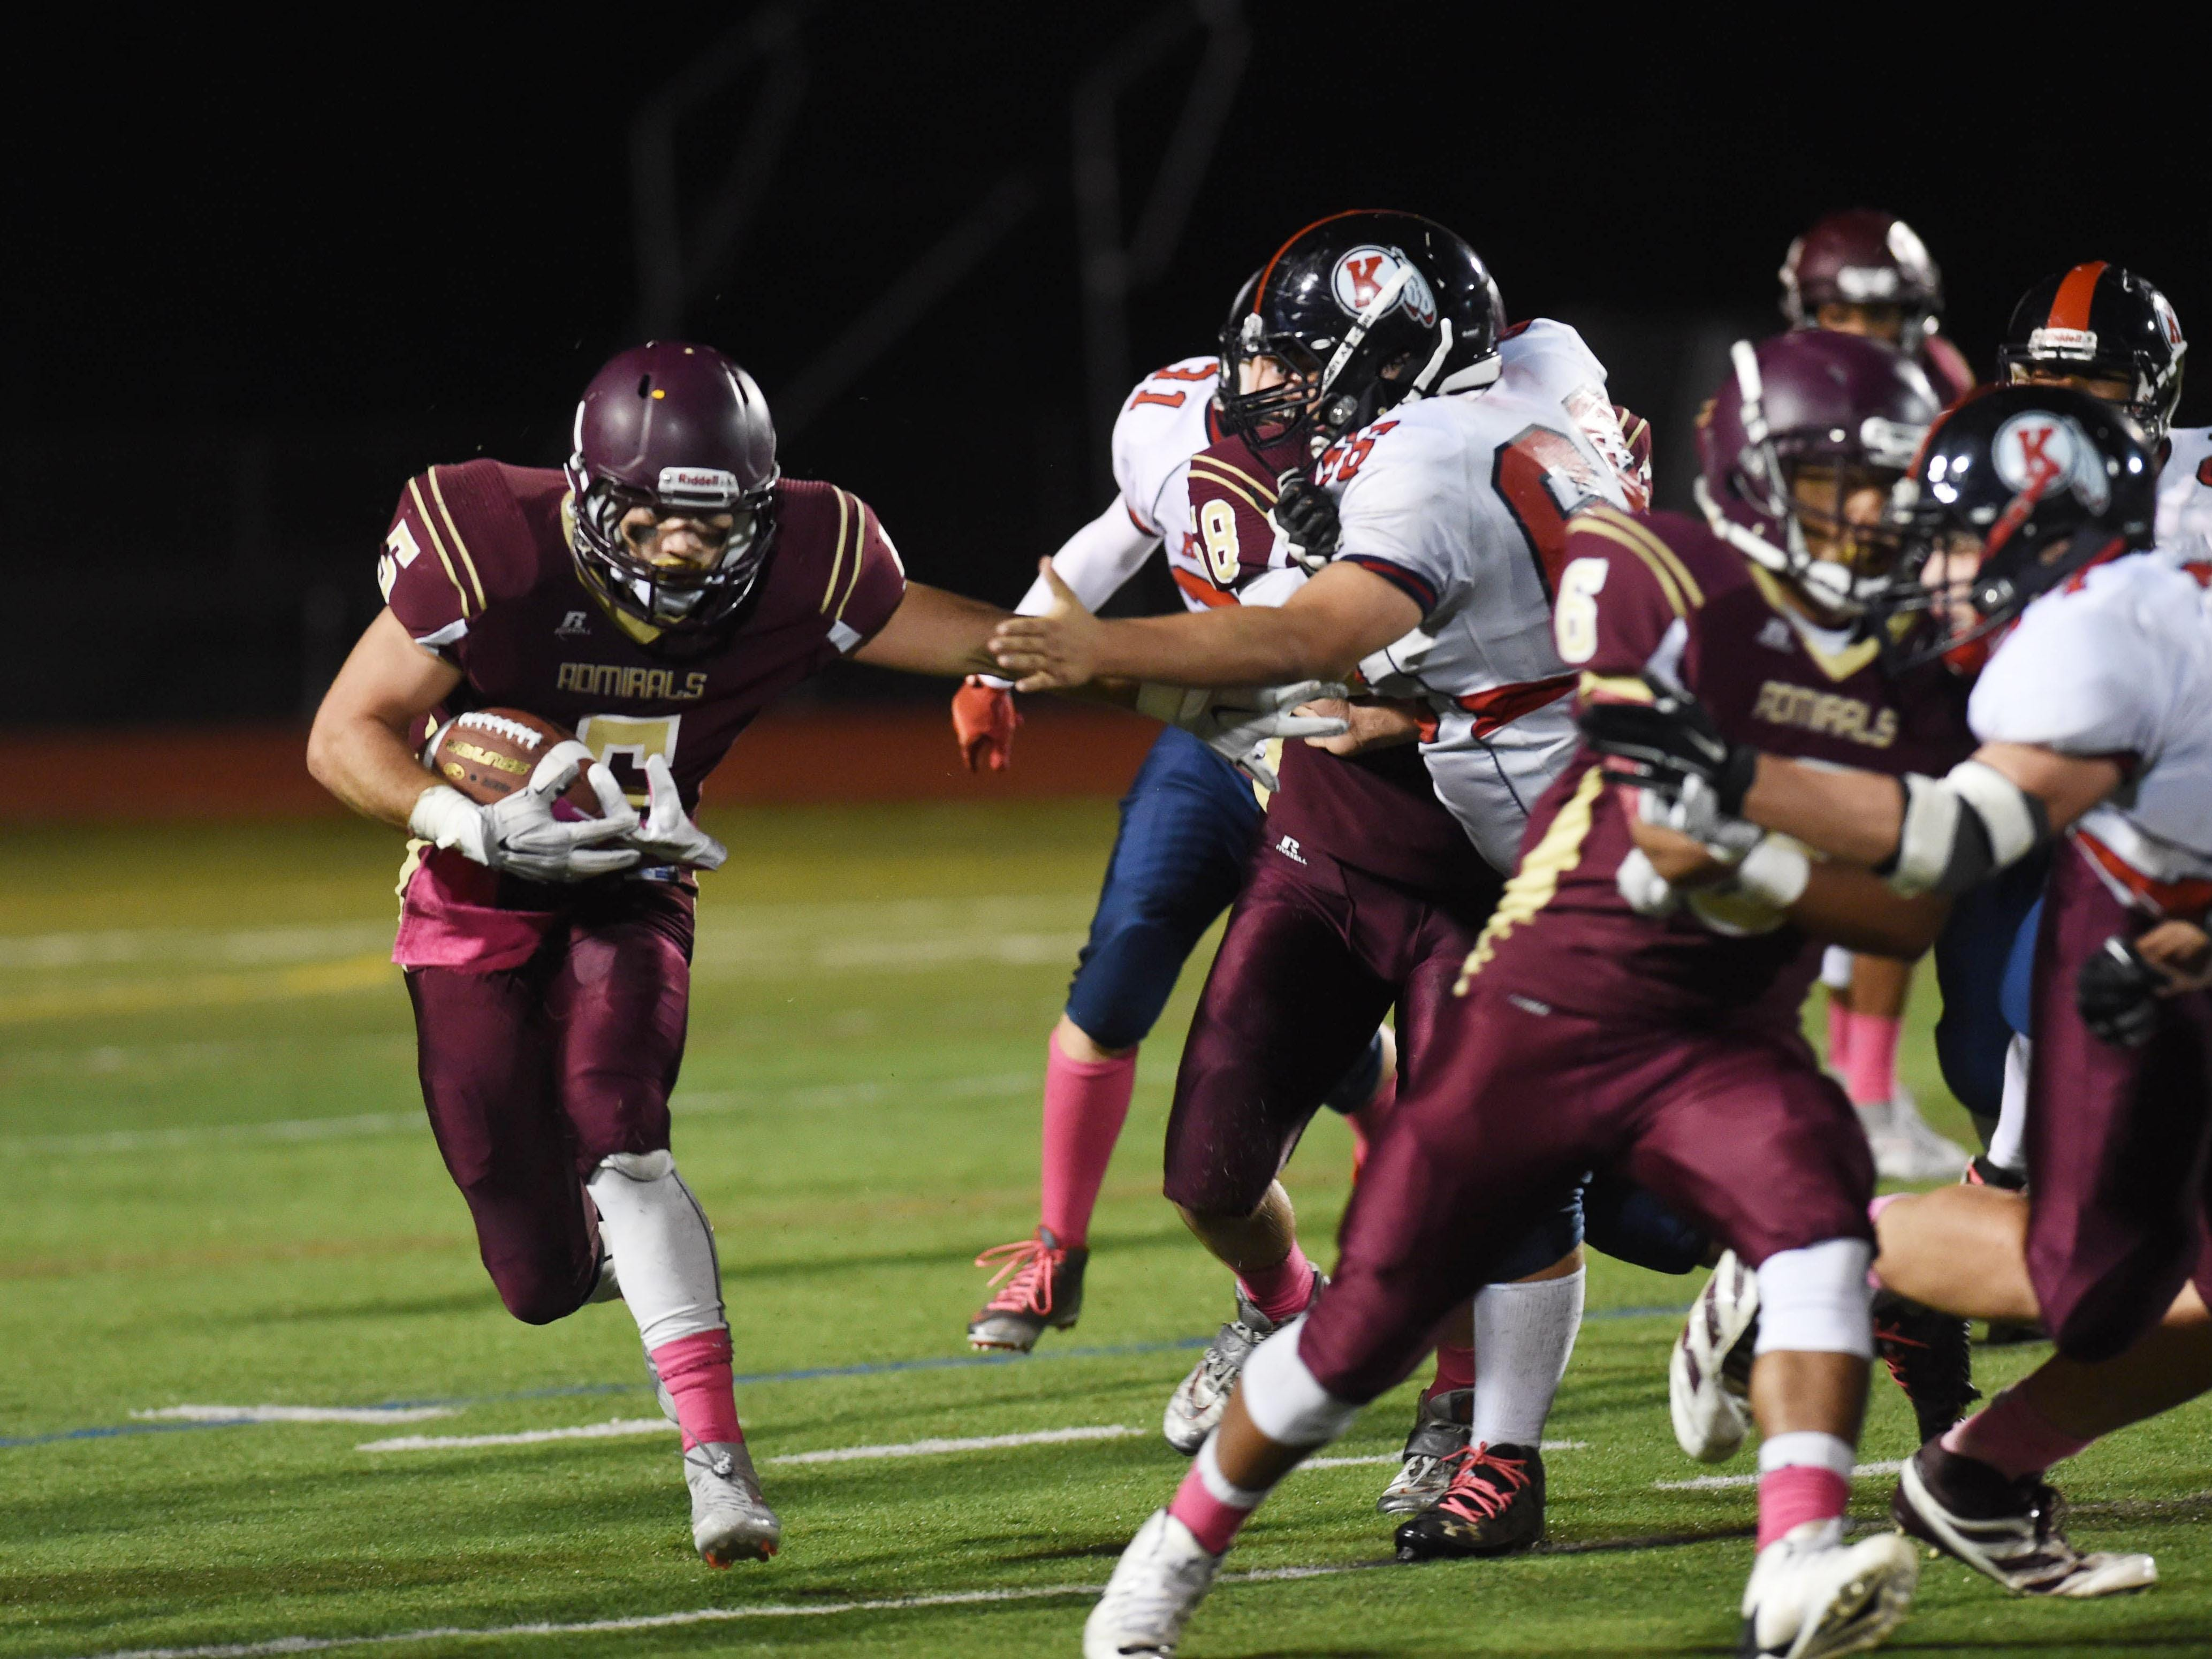 Arlington High School's Rob Tannenbaum shakes off a Roy C. Ketcham tackler on Friday in Freedom Plains.